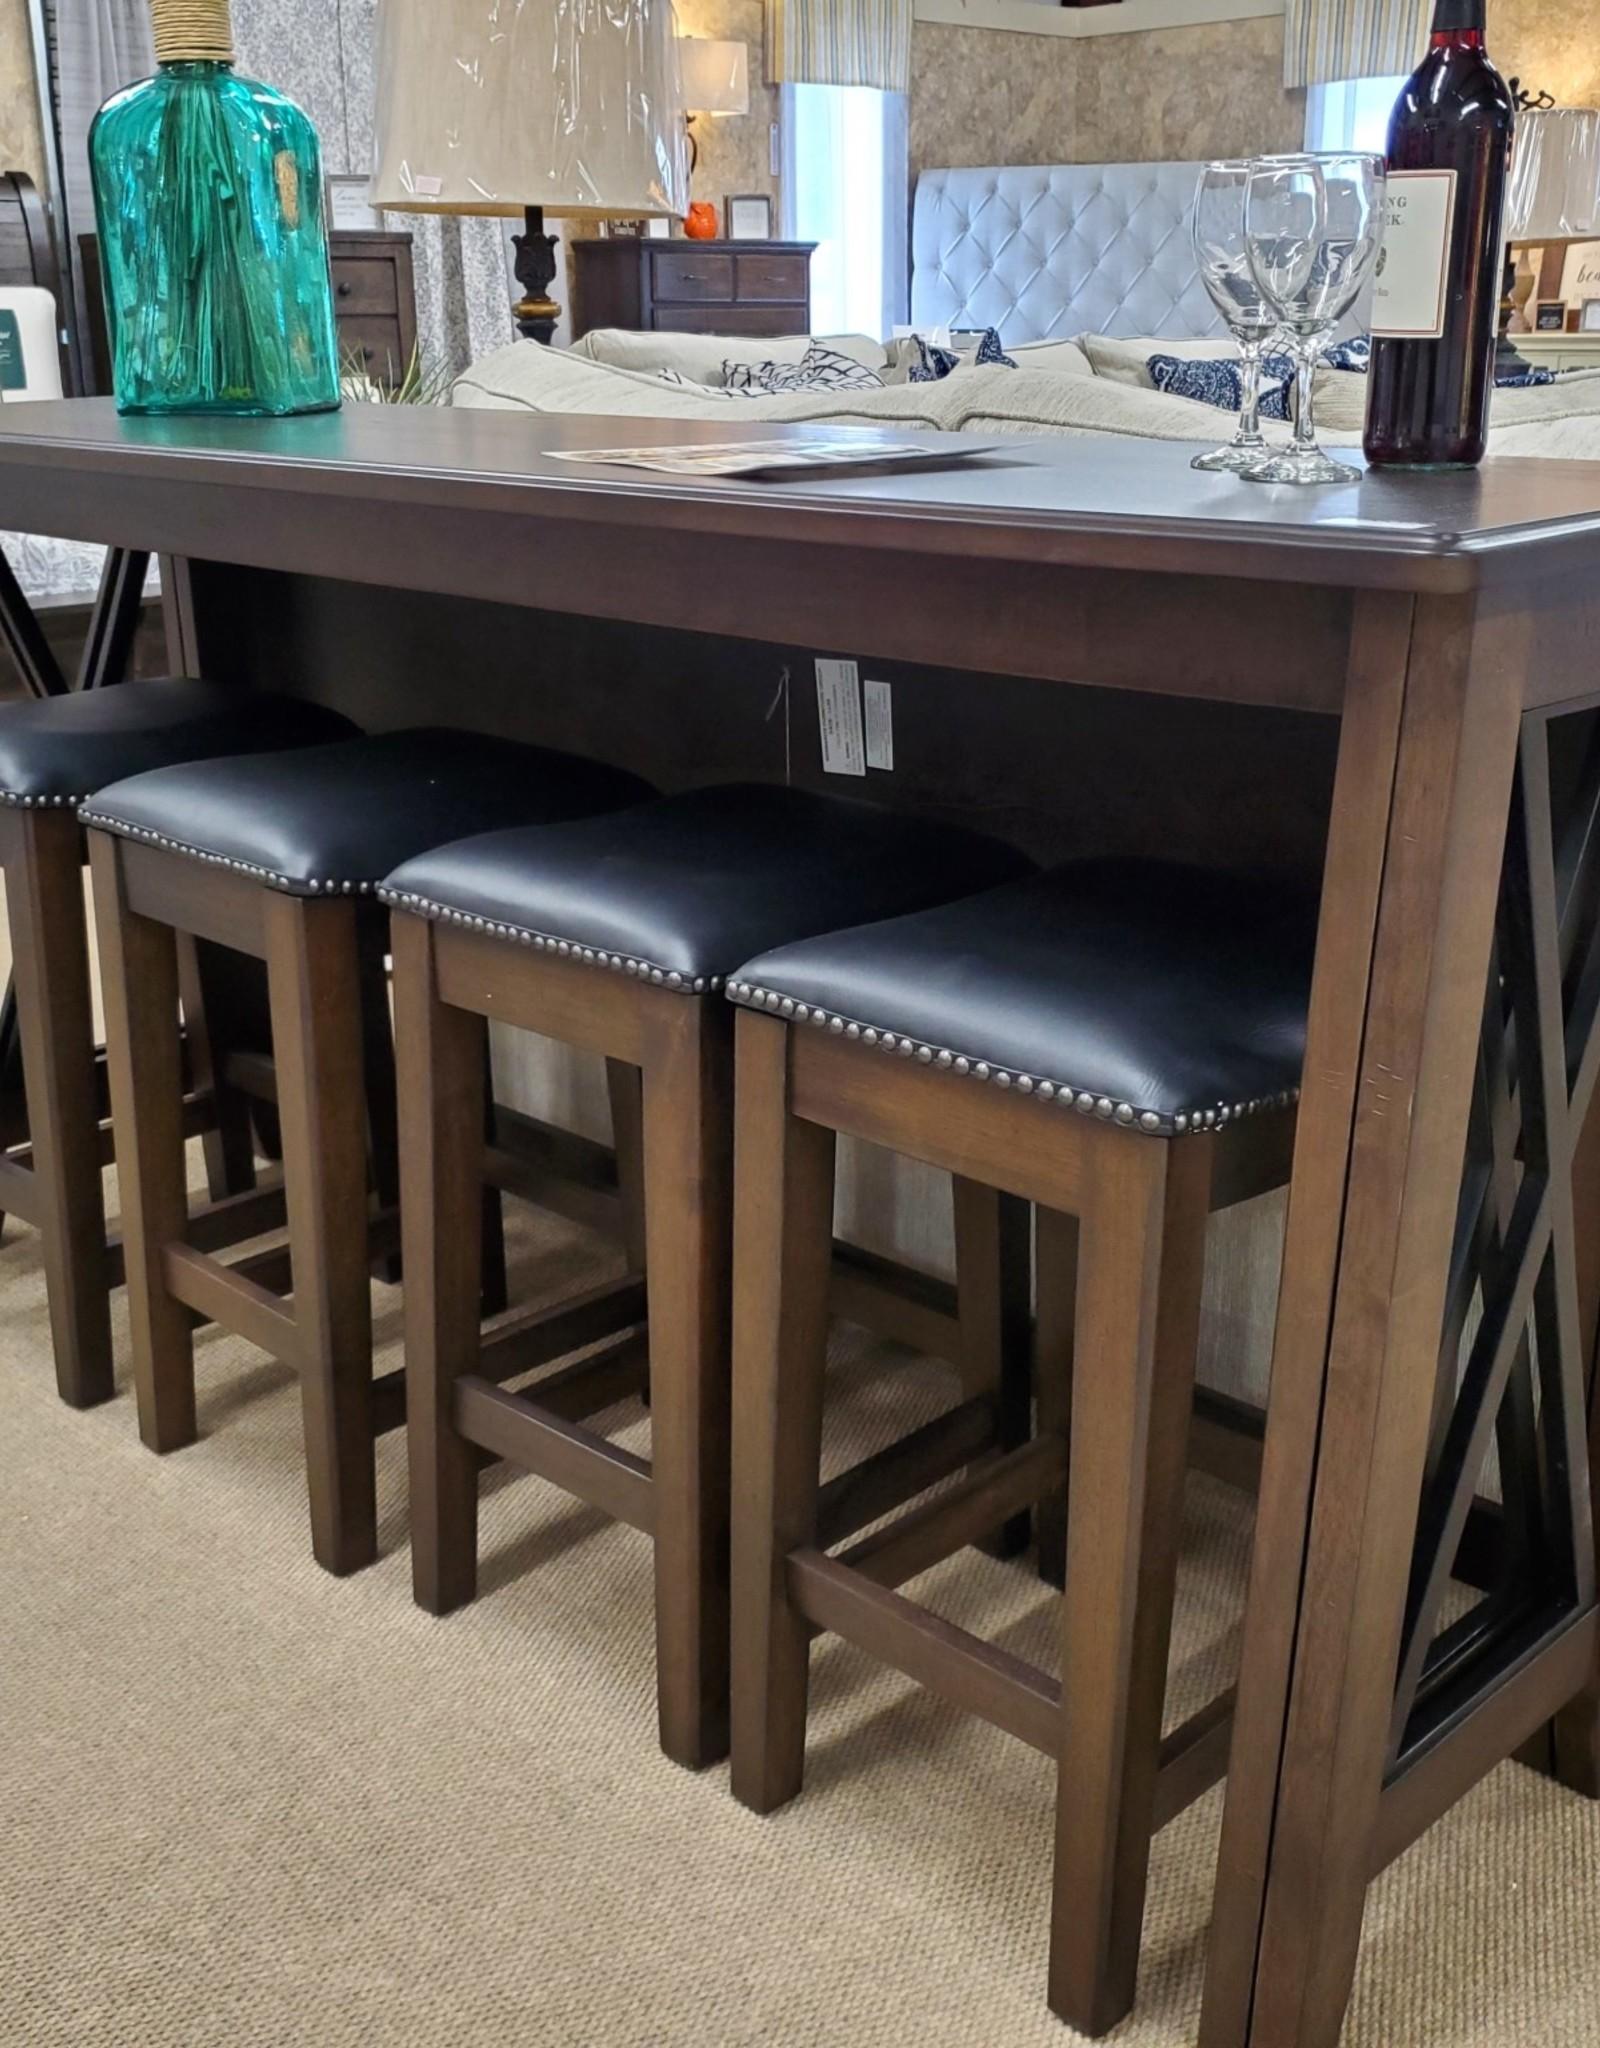 Bernards Carmino Sofa Bar w/ Drop-down Table & 4 Stools - French Gray